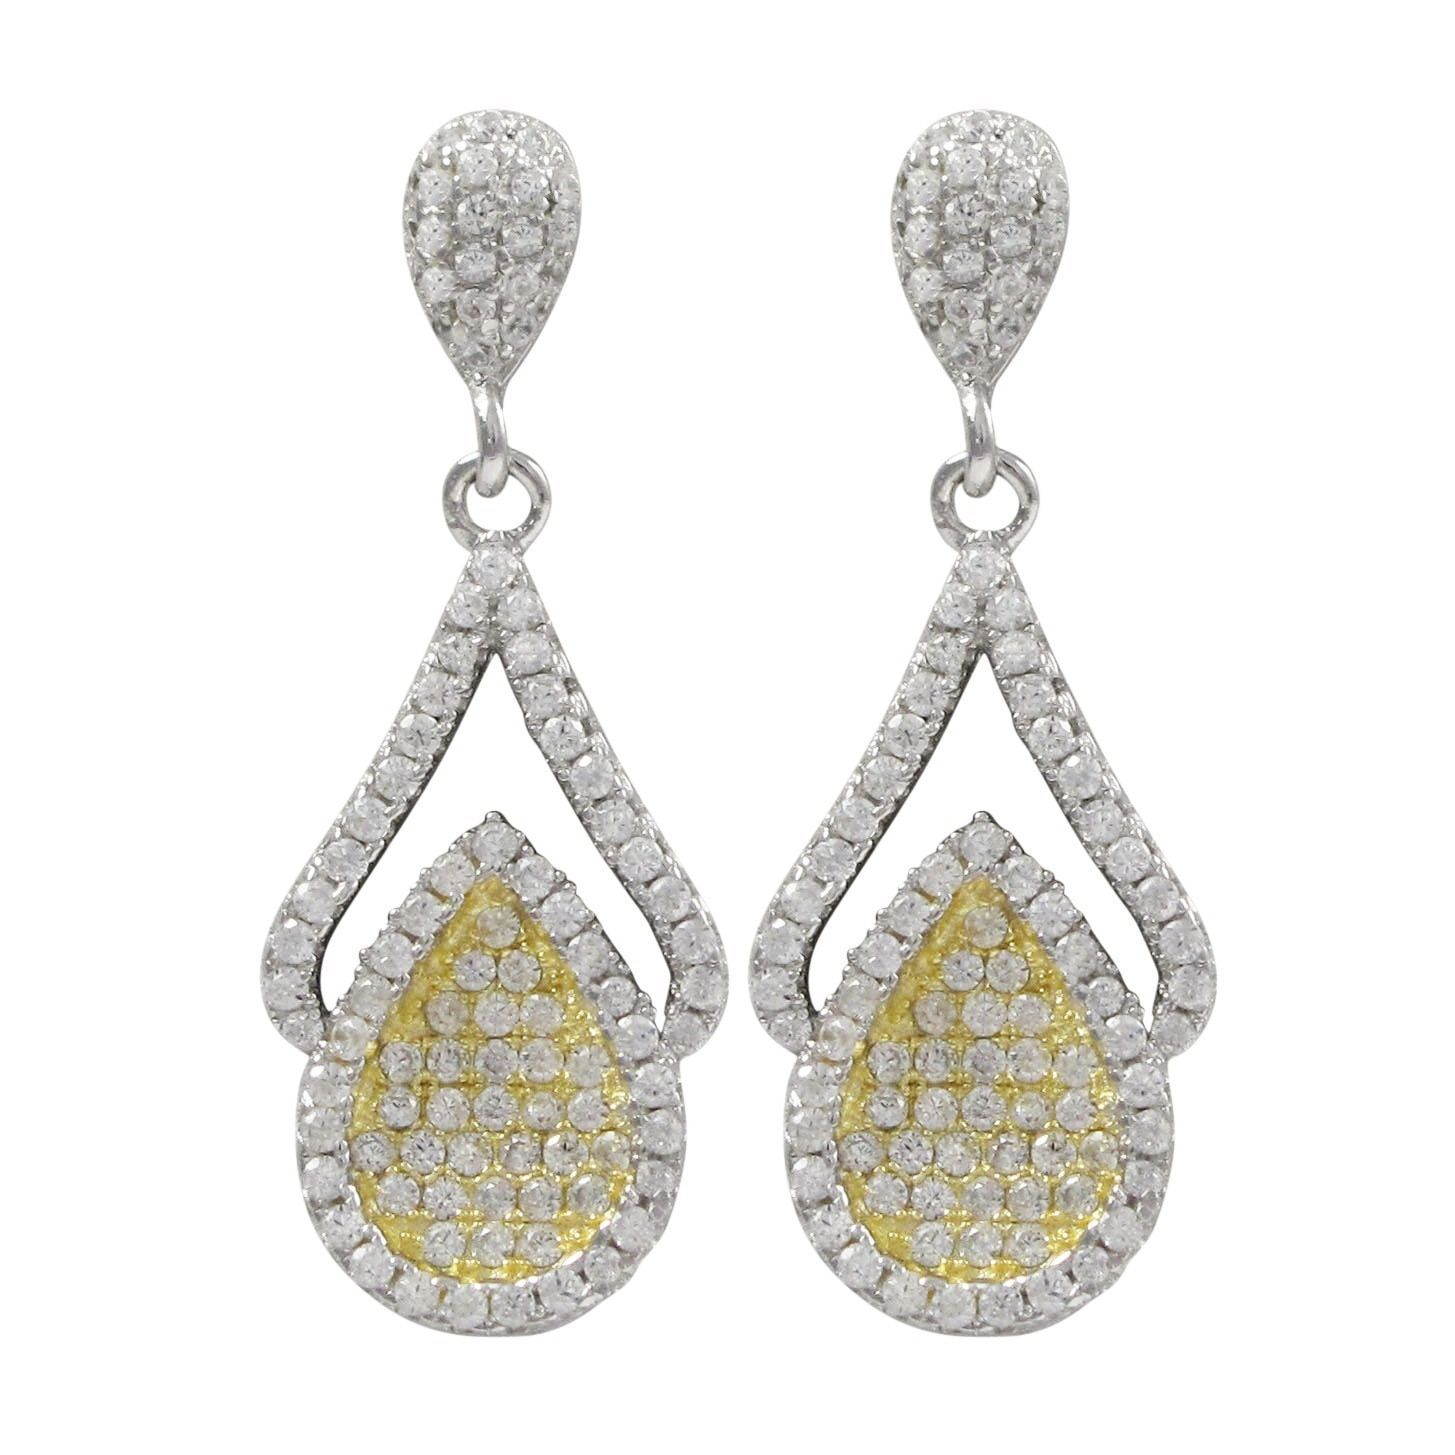 Rose Gold Finish Sterling Pave Cubic Zirconia Teardrop Earrings